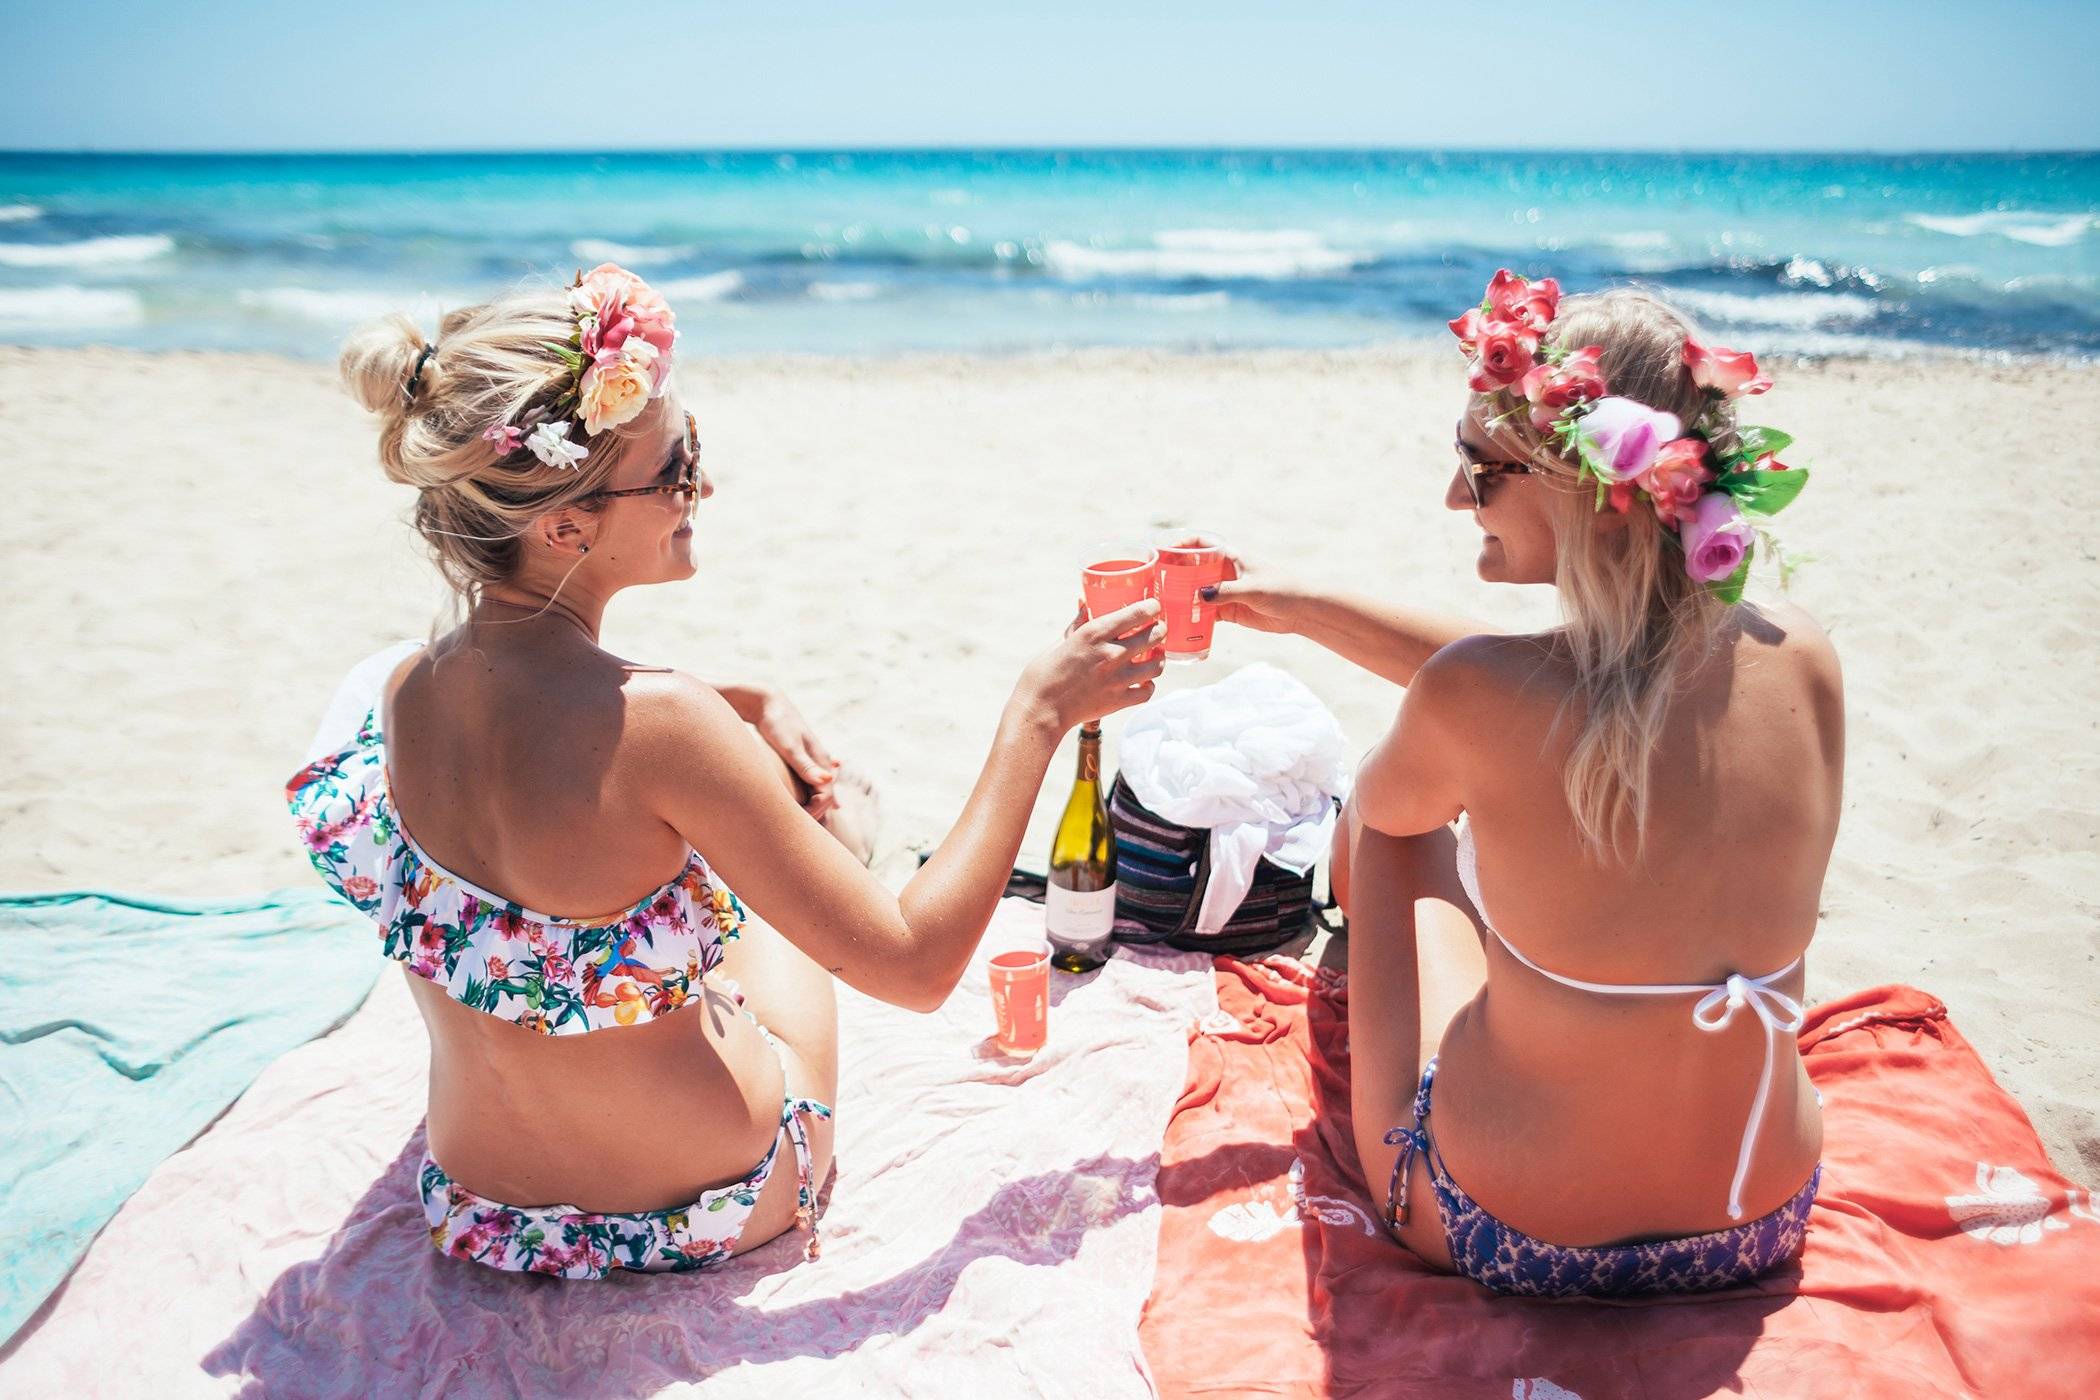 mikuta beach days